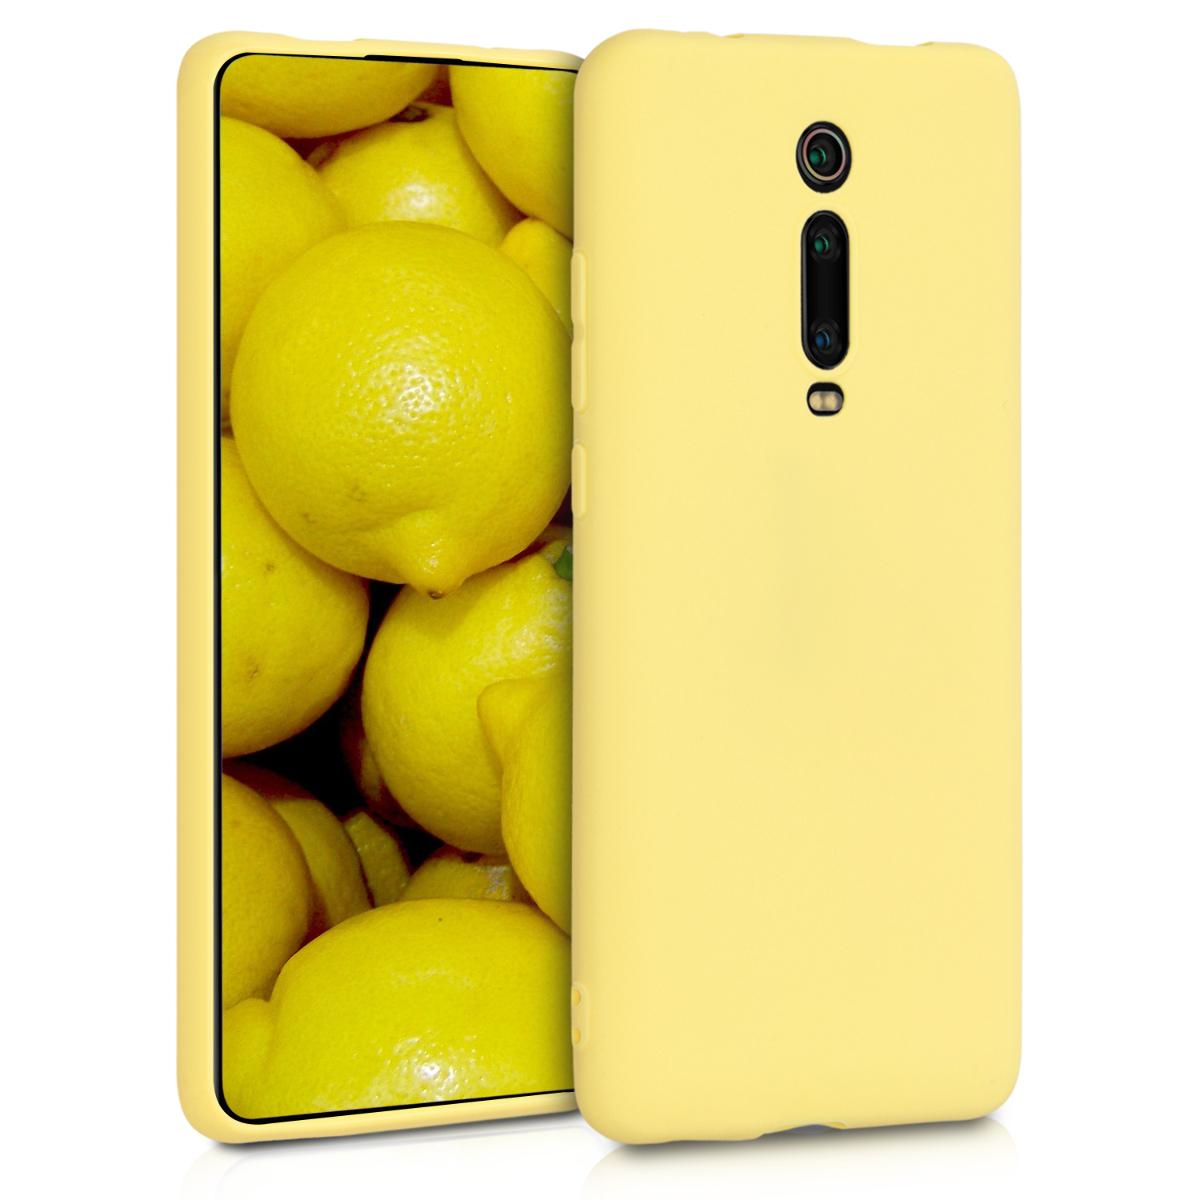 KW Θήκη Σιλικόνης Xiaomi Mi 9T / Redmi K20 Pro - Yellow Matte (49224.49)